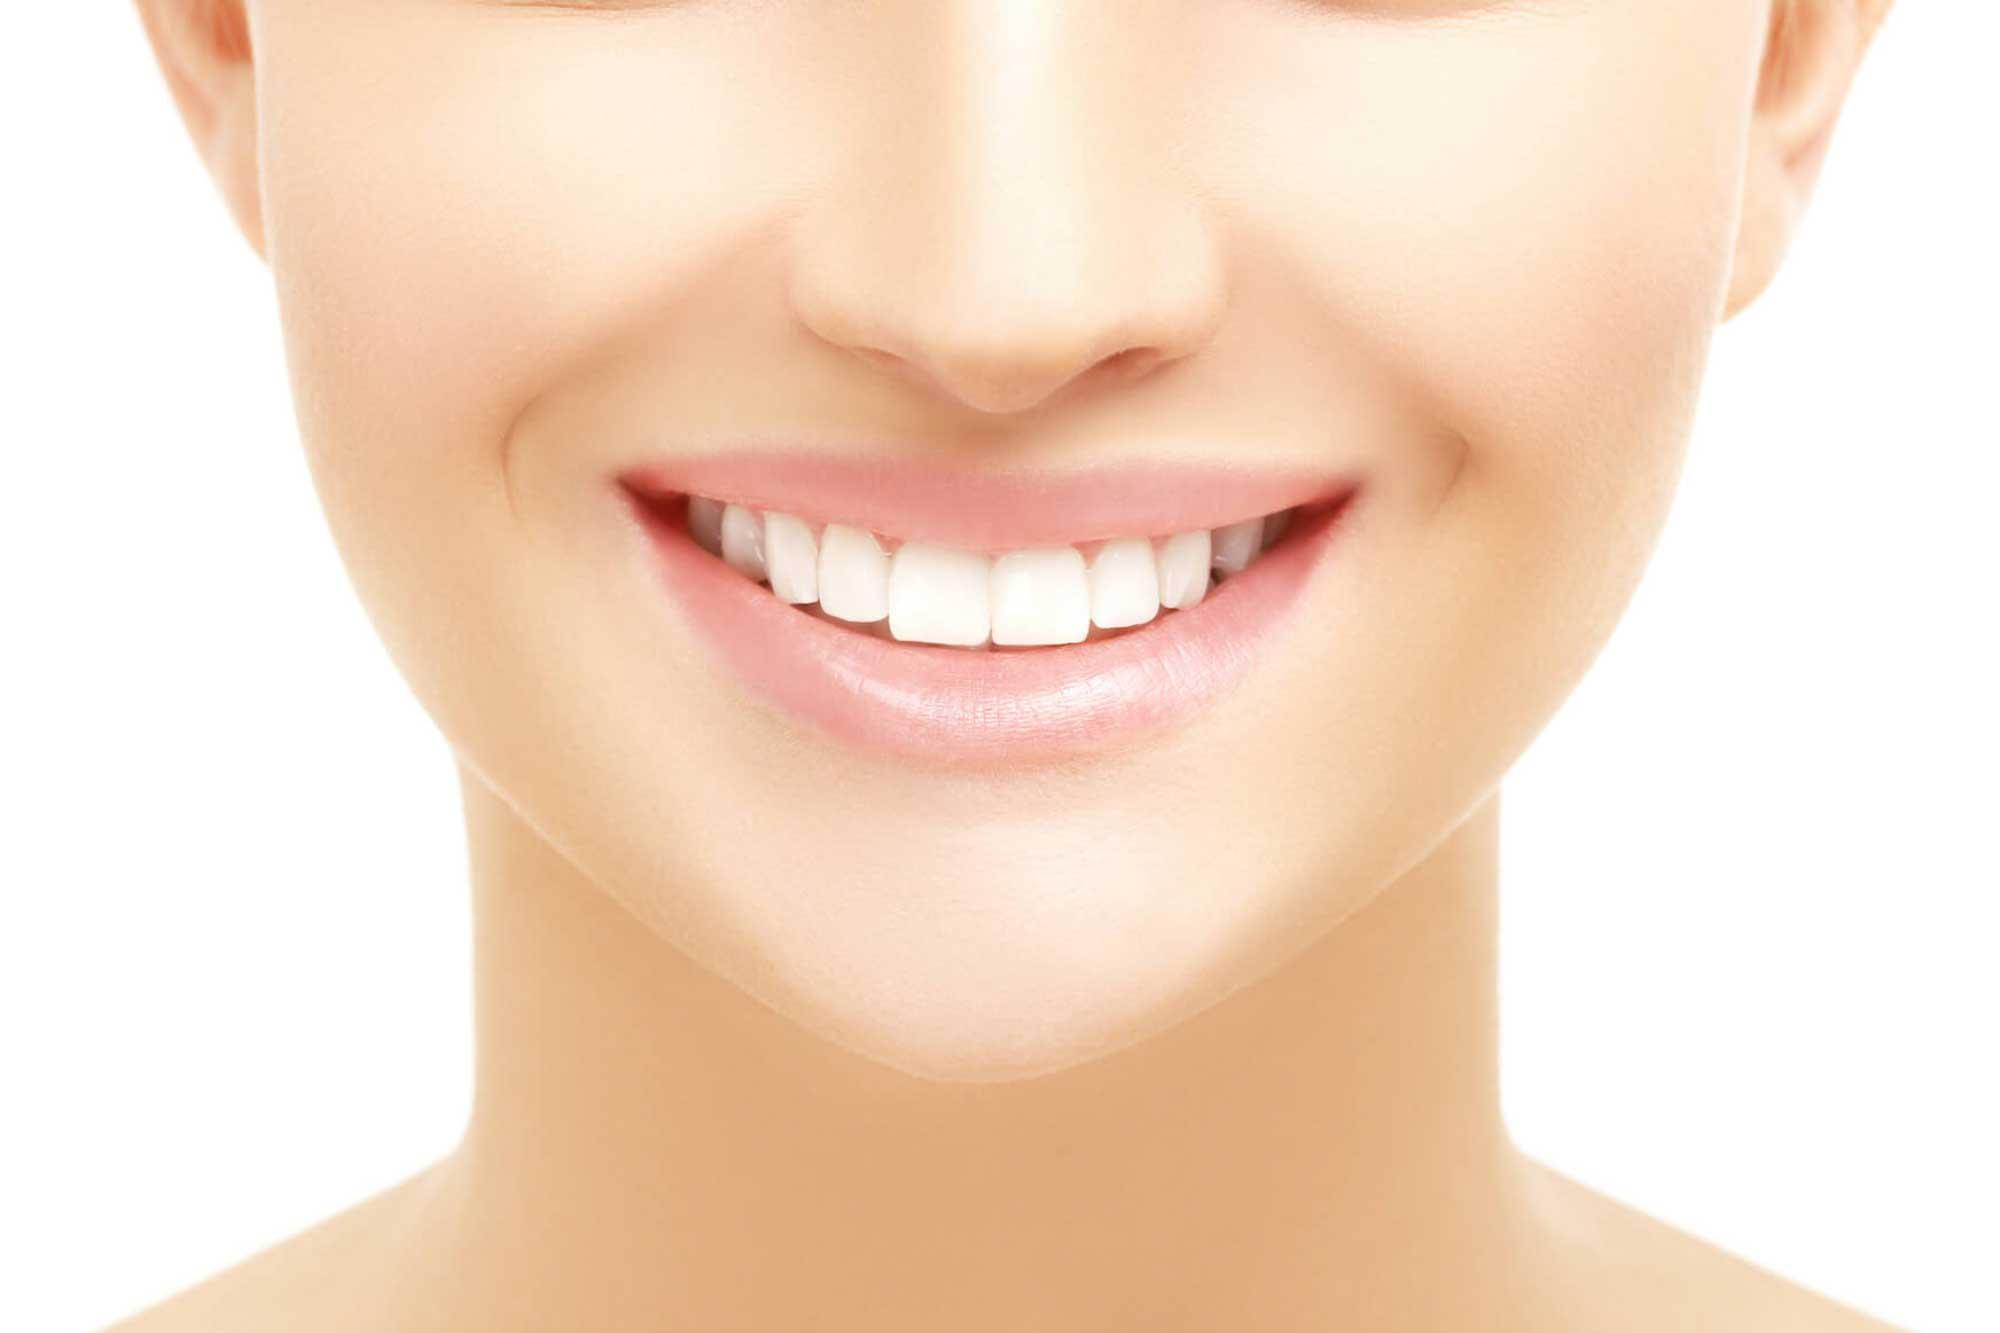 chin cheek implants before and after photo gallery plastic surgery atlanta ga